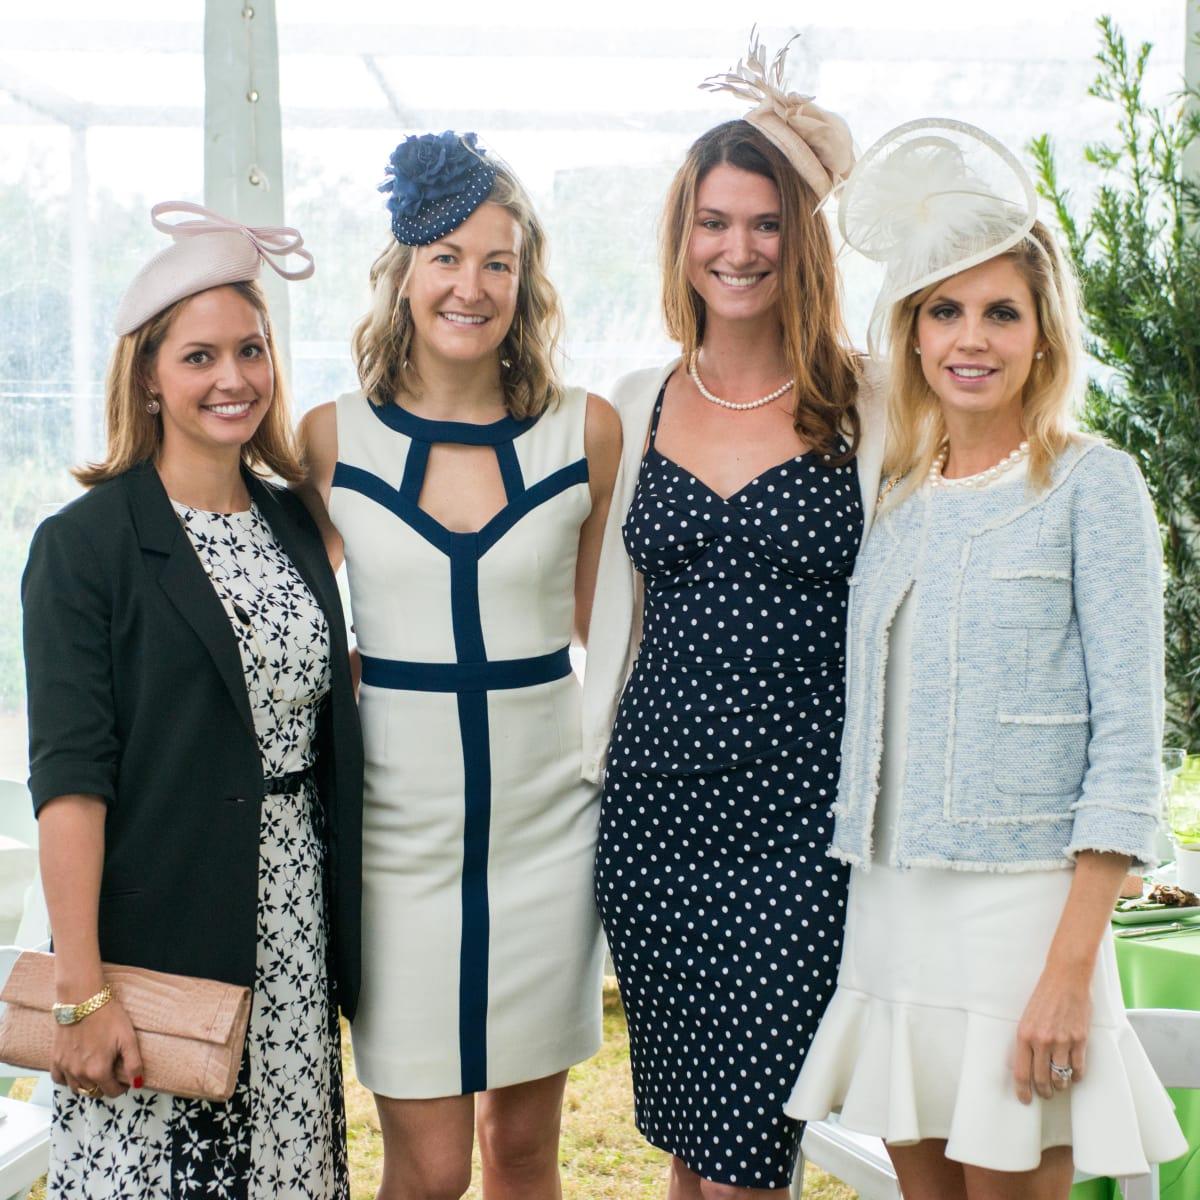 Hats in the Park, March 2016,Linsey Looke, Melissa Tuckerman, Brittany O'Brien, Meredith Monrad